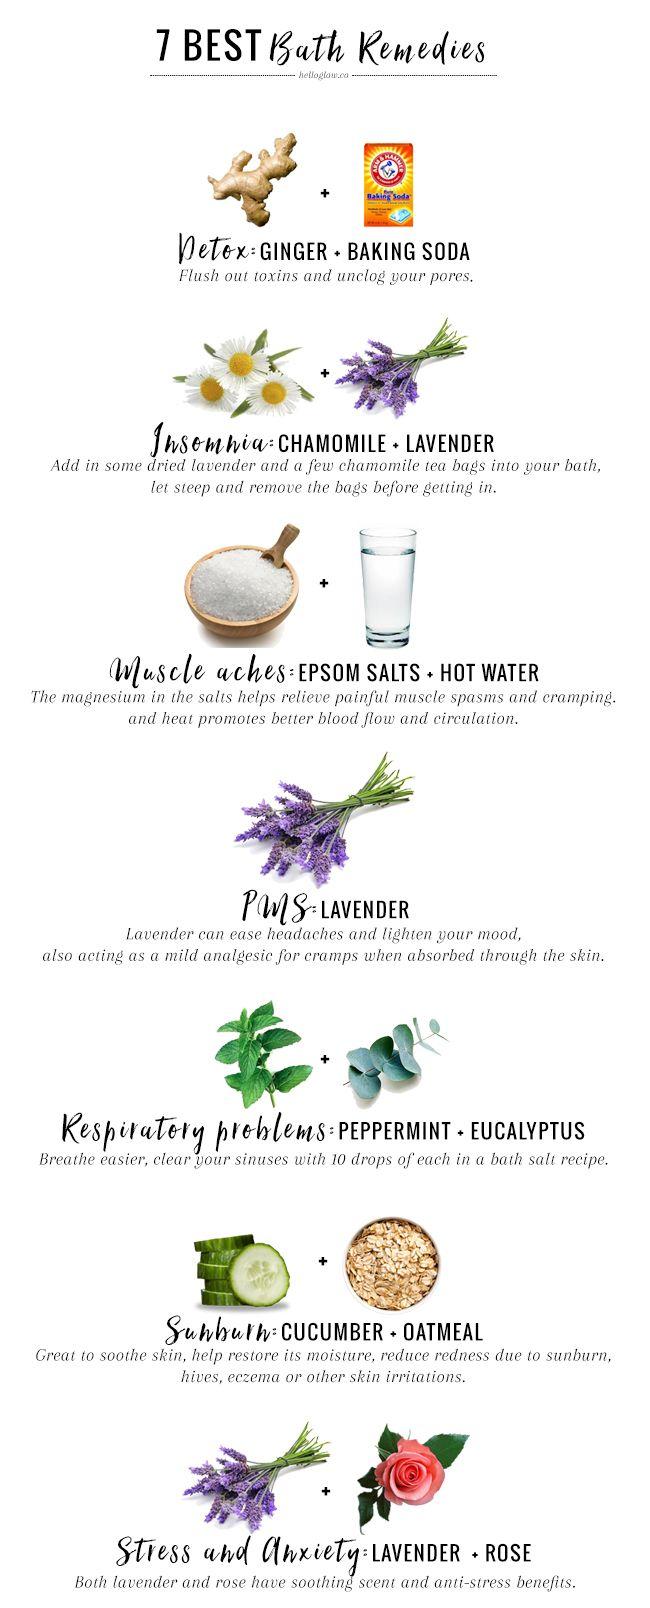 7 Best Bath Remedies For Everyday Ailments | http://helloglow.co/best-bath-remedies/